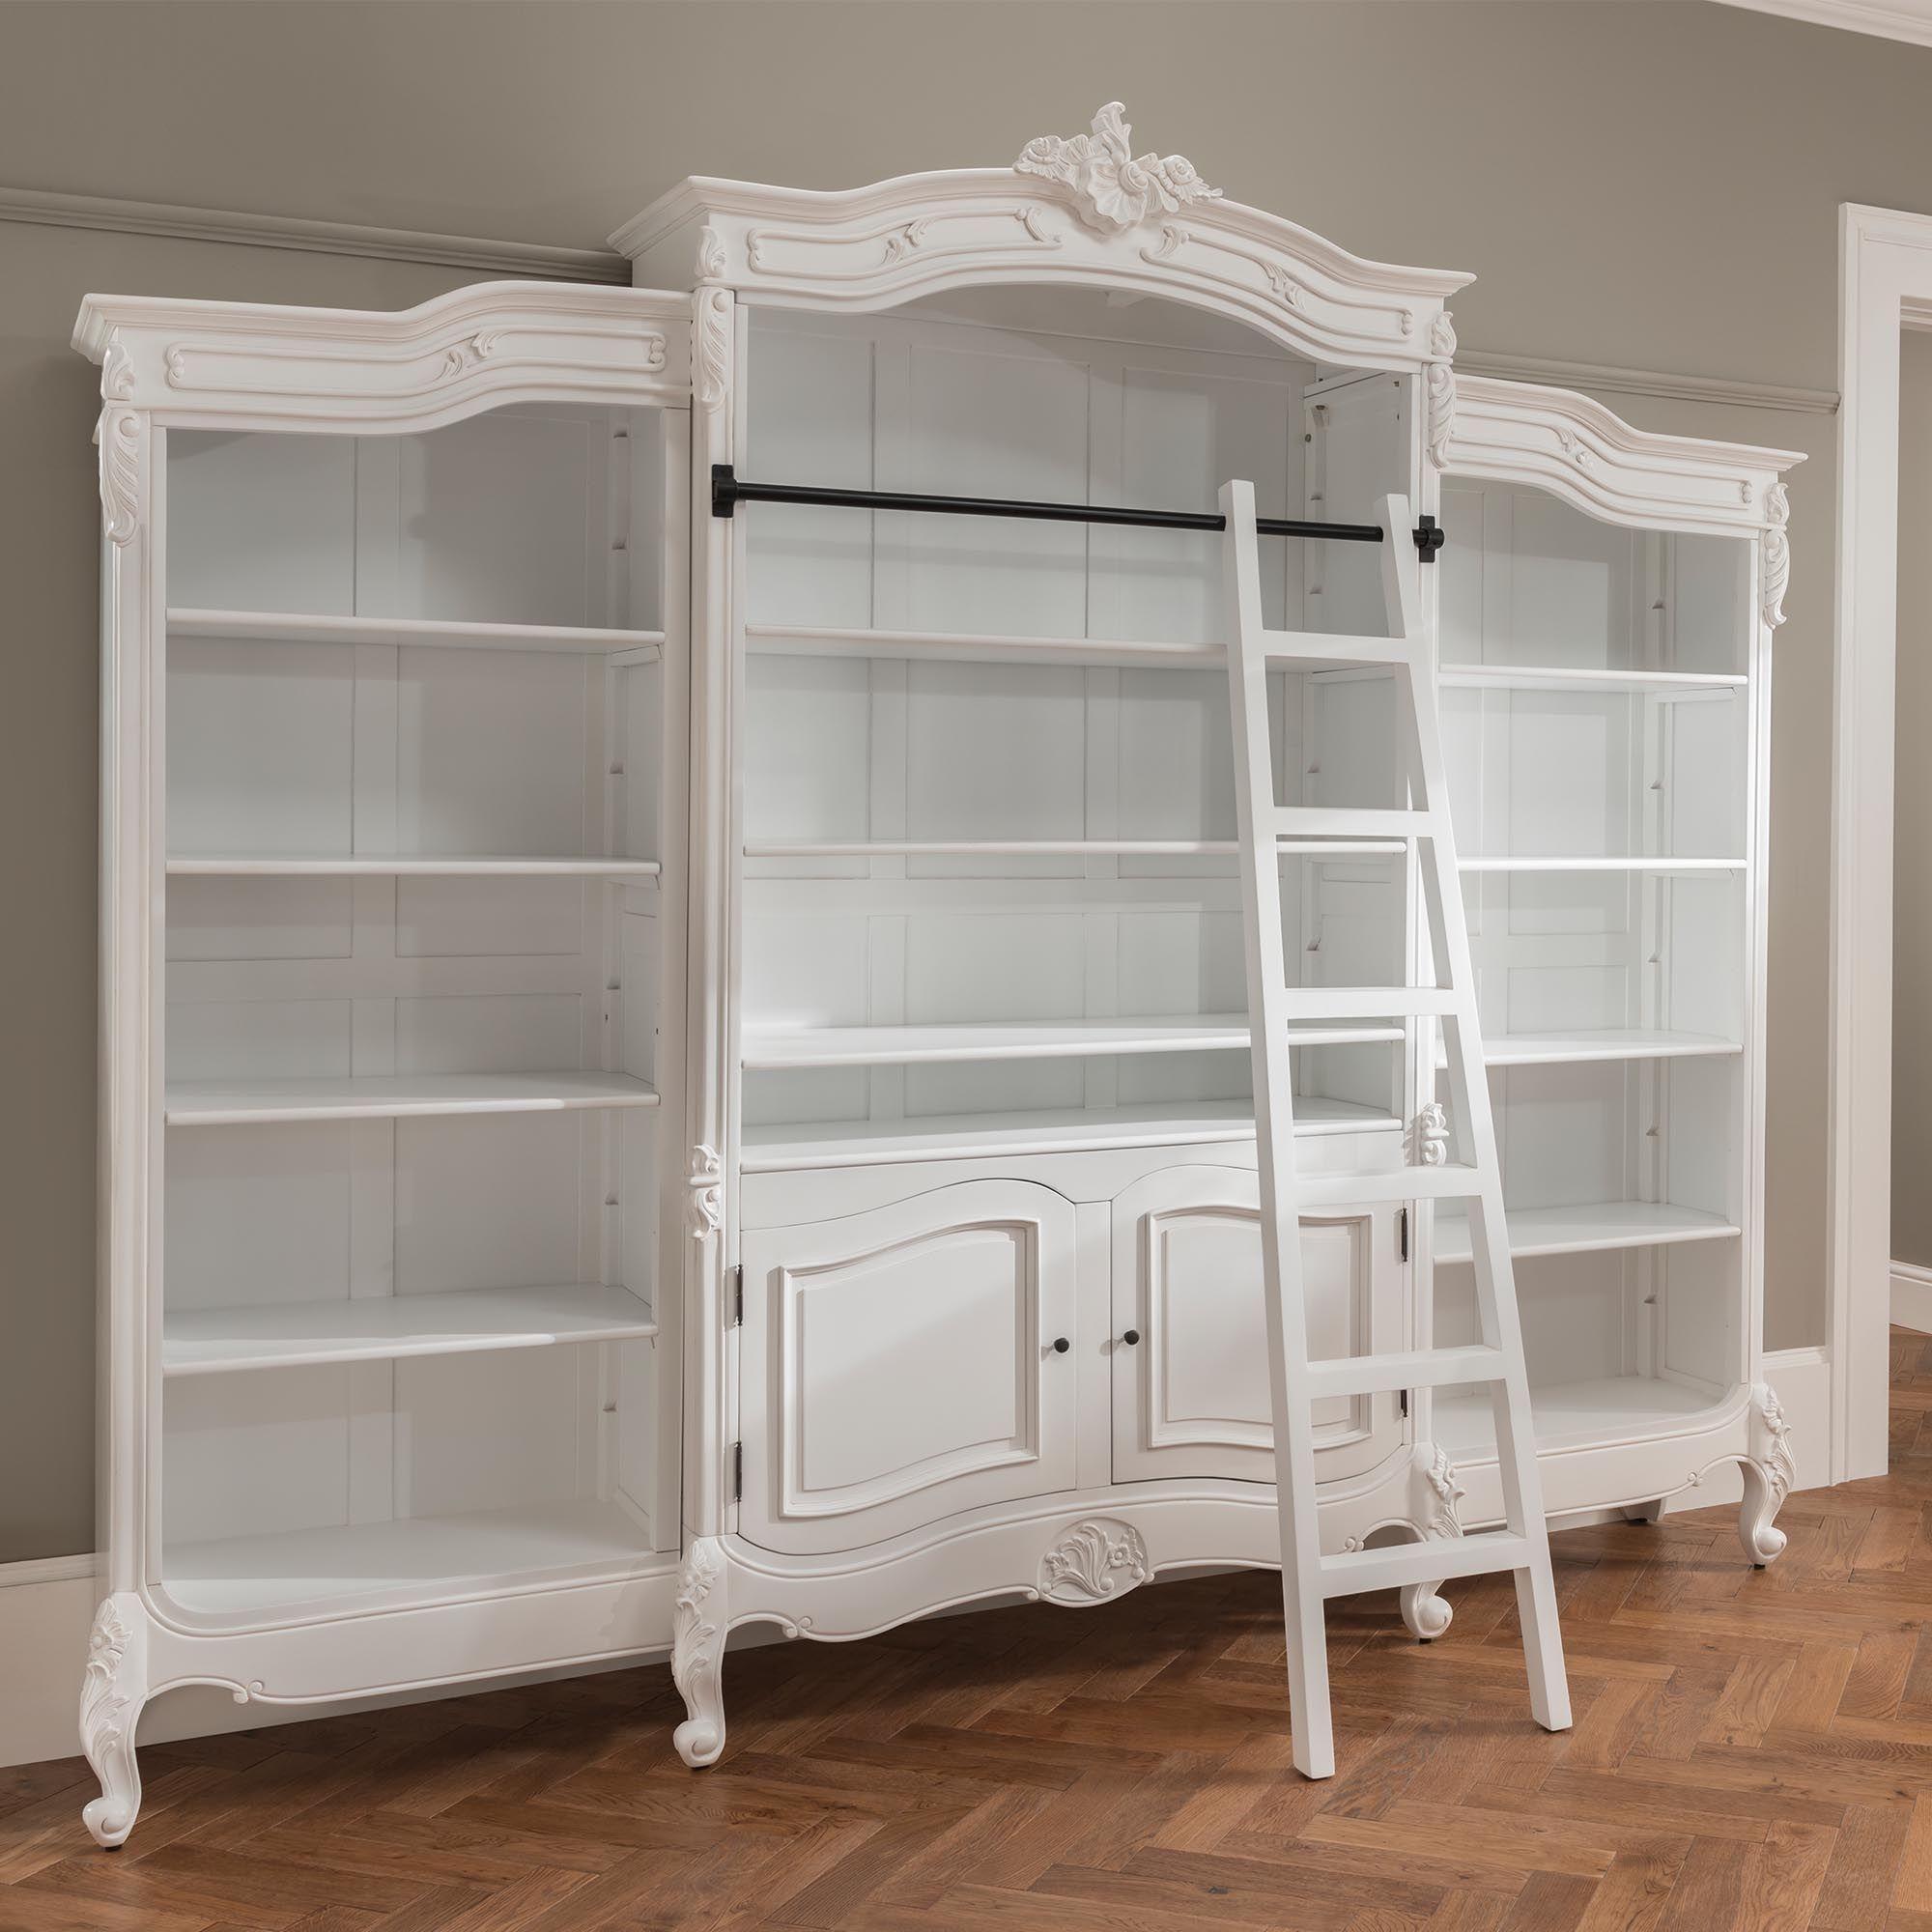 Antique French Style Bookcase Ev Icin Kitaplik Furniture